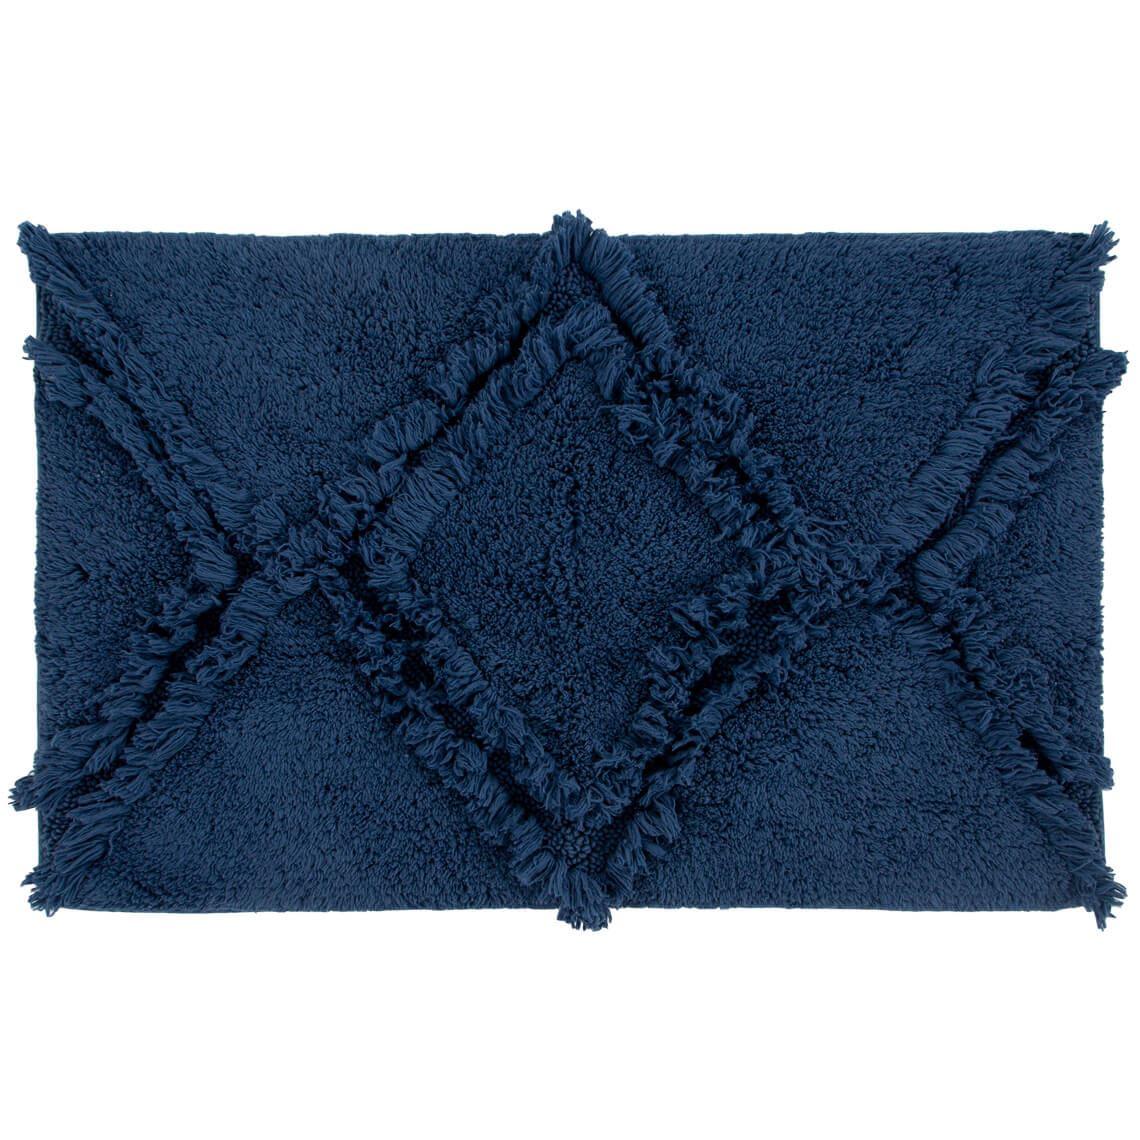 Kris Bathmat Size W 50cm x D 80cm x H 2cm in Blue 100% Cotton Freedom